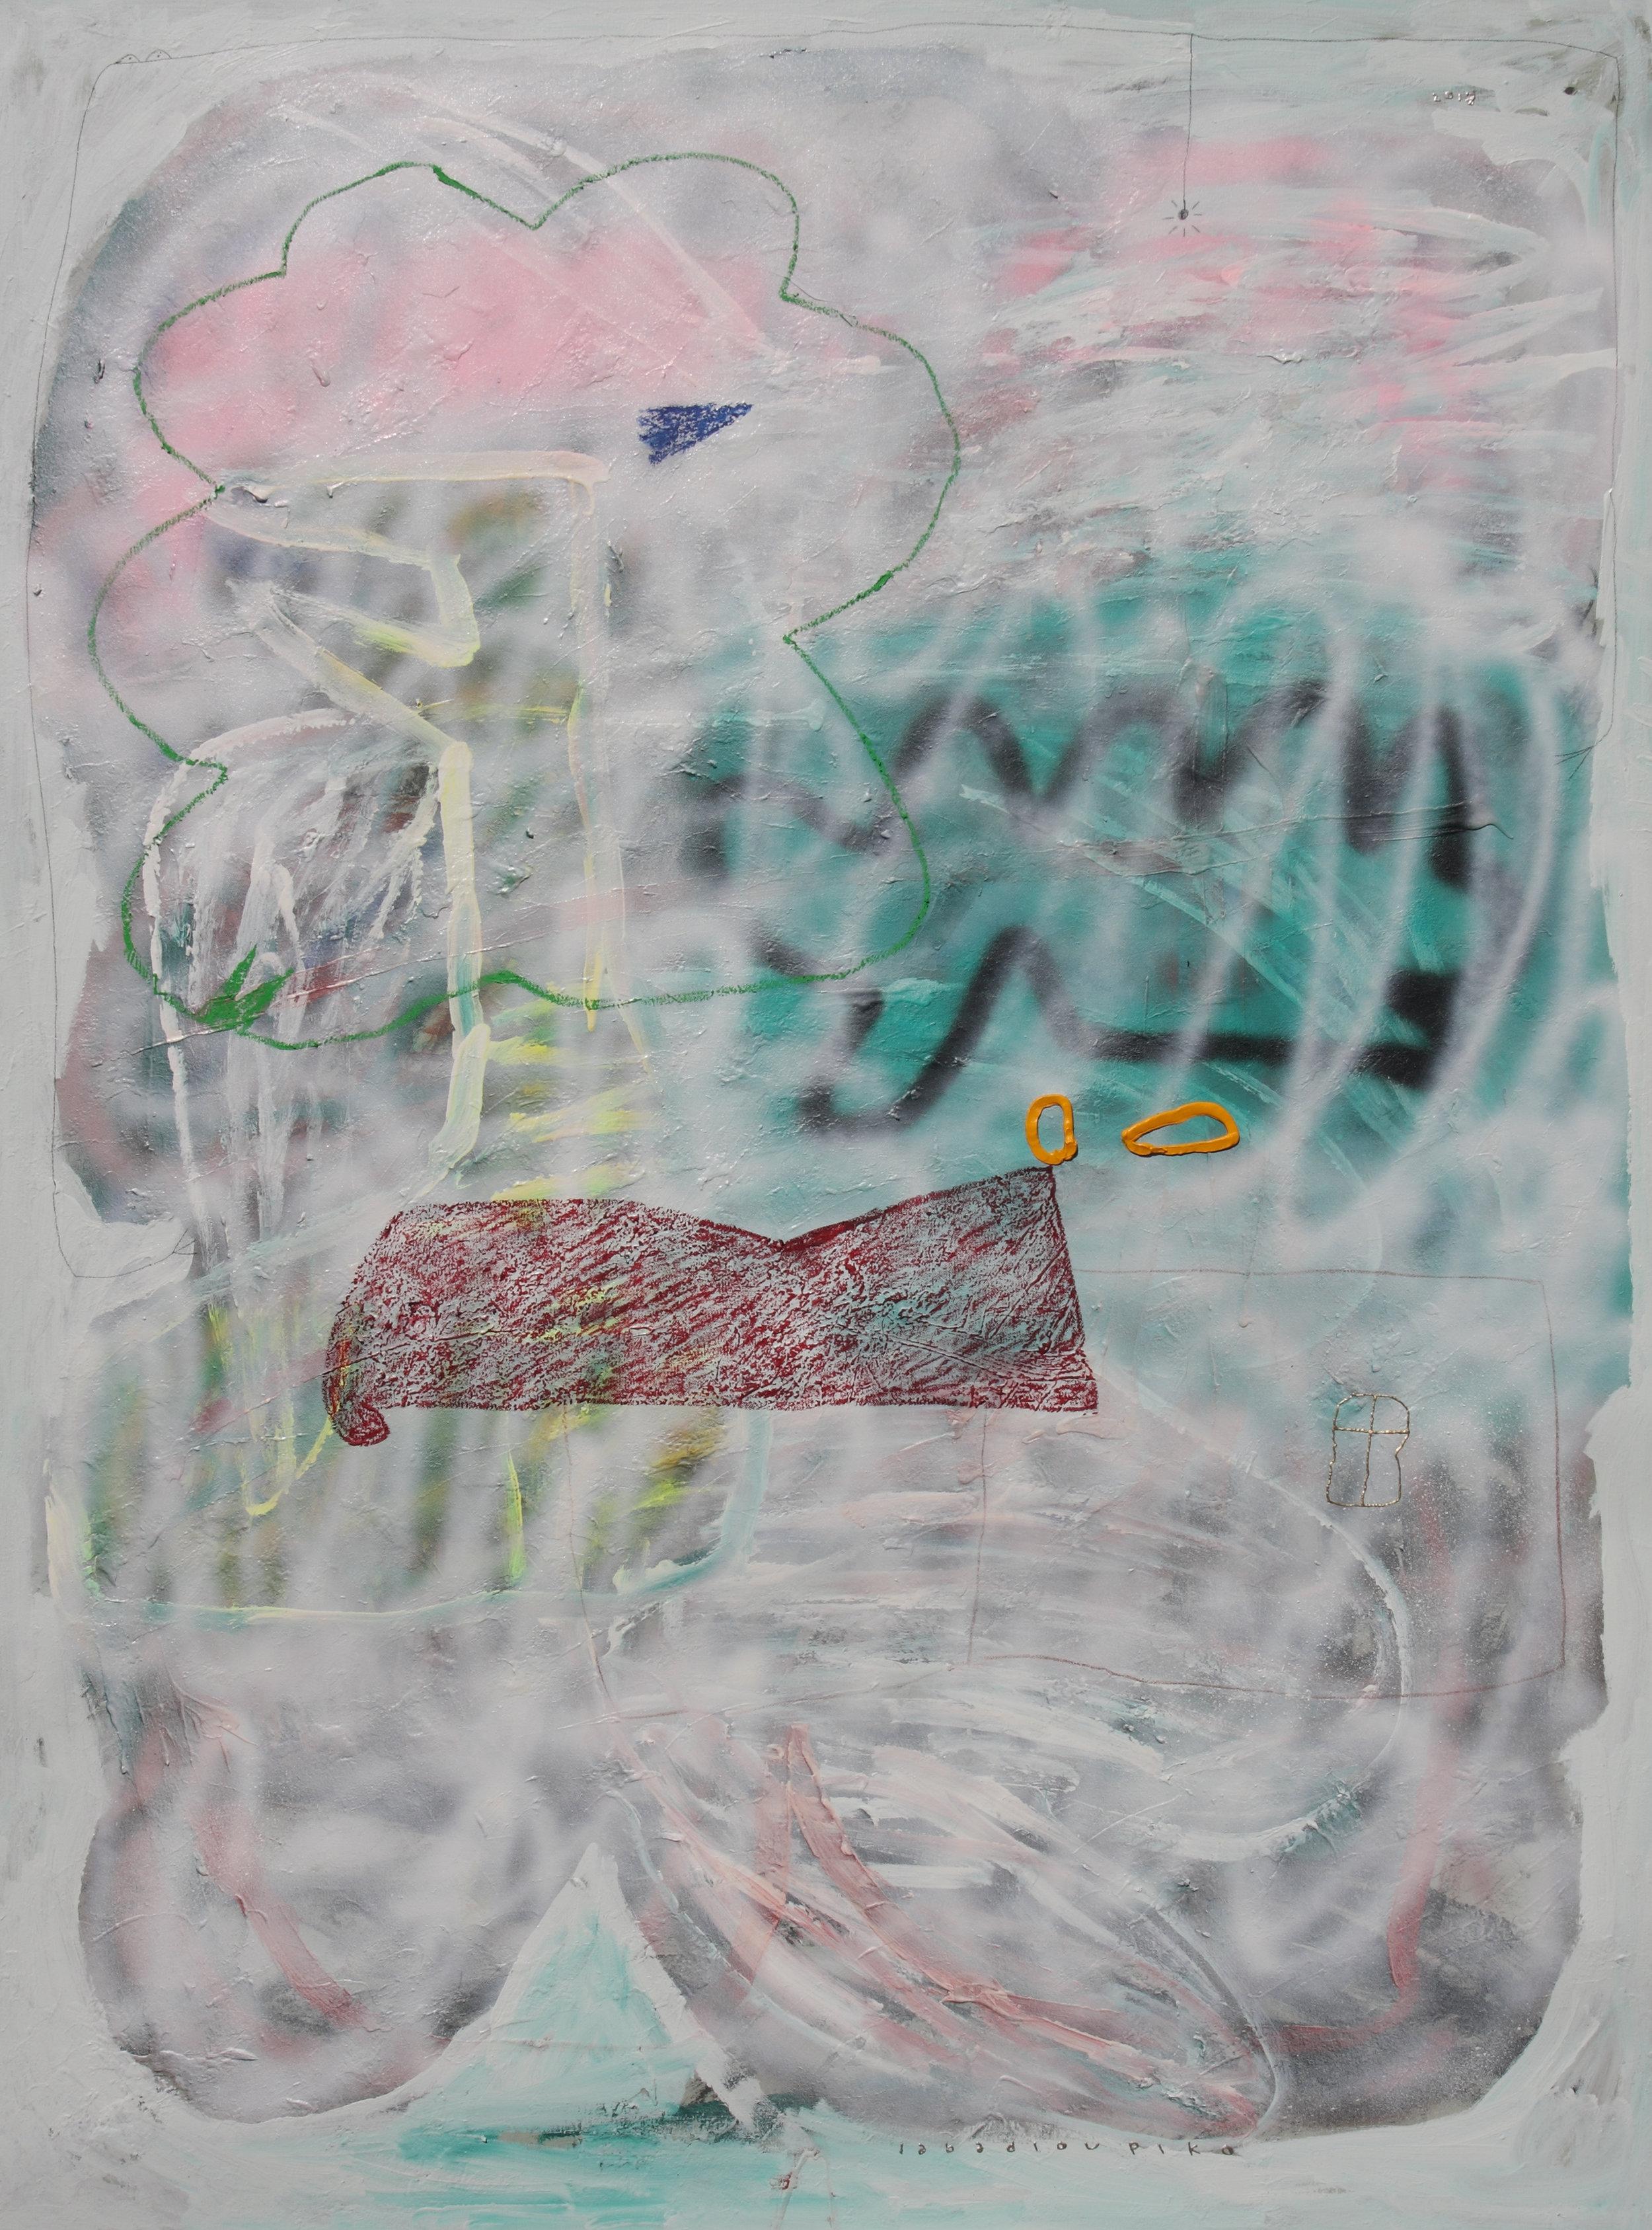 Artist: Iabadiou Piko, (INDONESIA)  Title: Putih Setelah Warna Medium: acrylic, bitumen, spray paint, color pencil, pencil, oil, oil bar, relief paint, charcoal, marker on linen blend Dimension: 200 cm x 150 cm Year: 2018